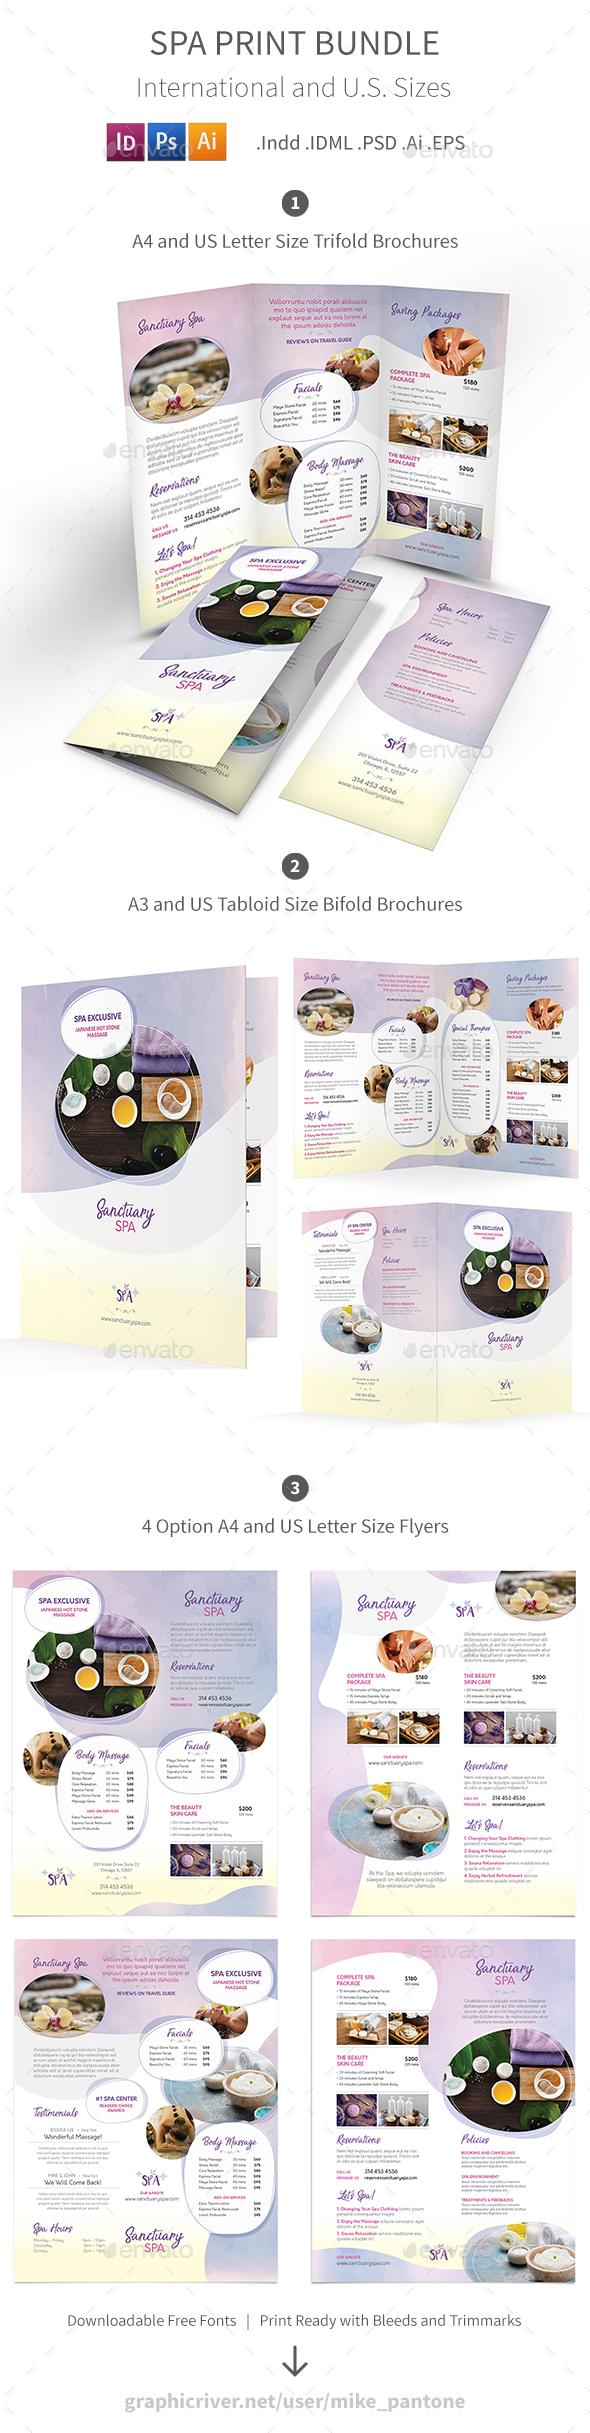 Spa Print Bundle 7 - Informational Brochures